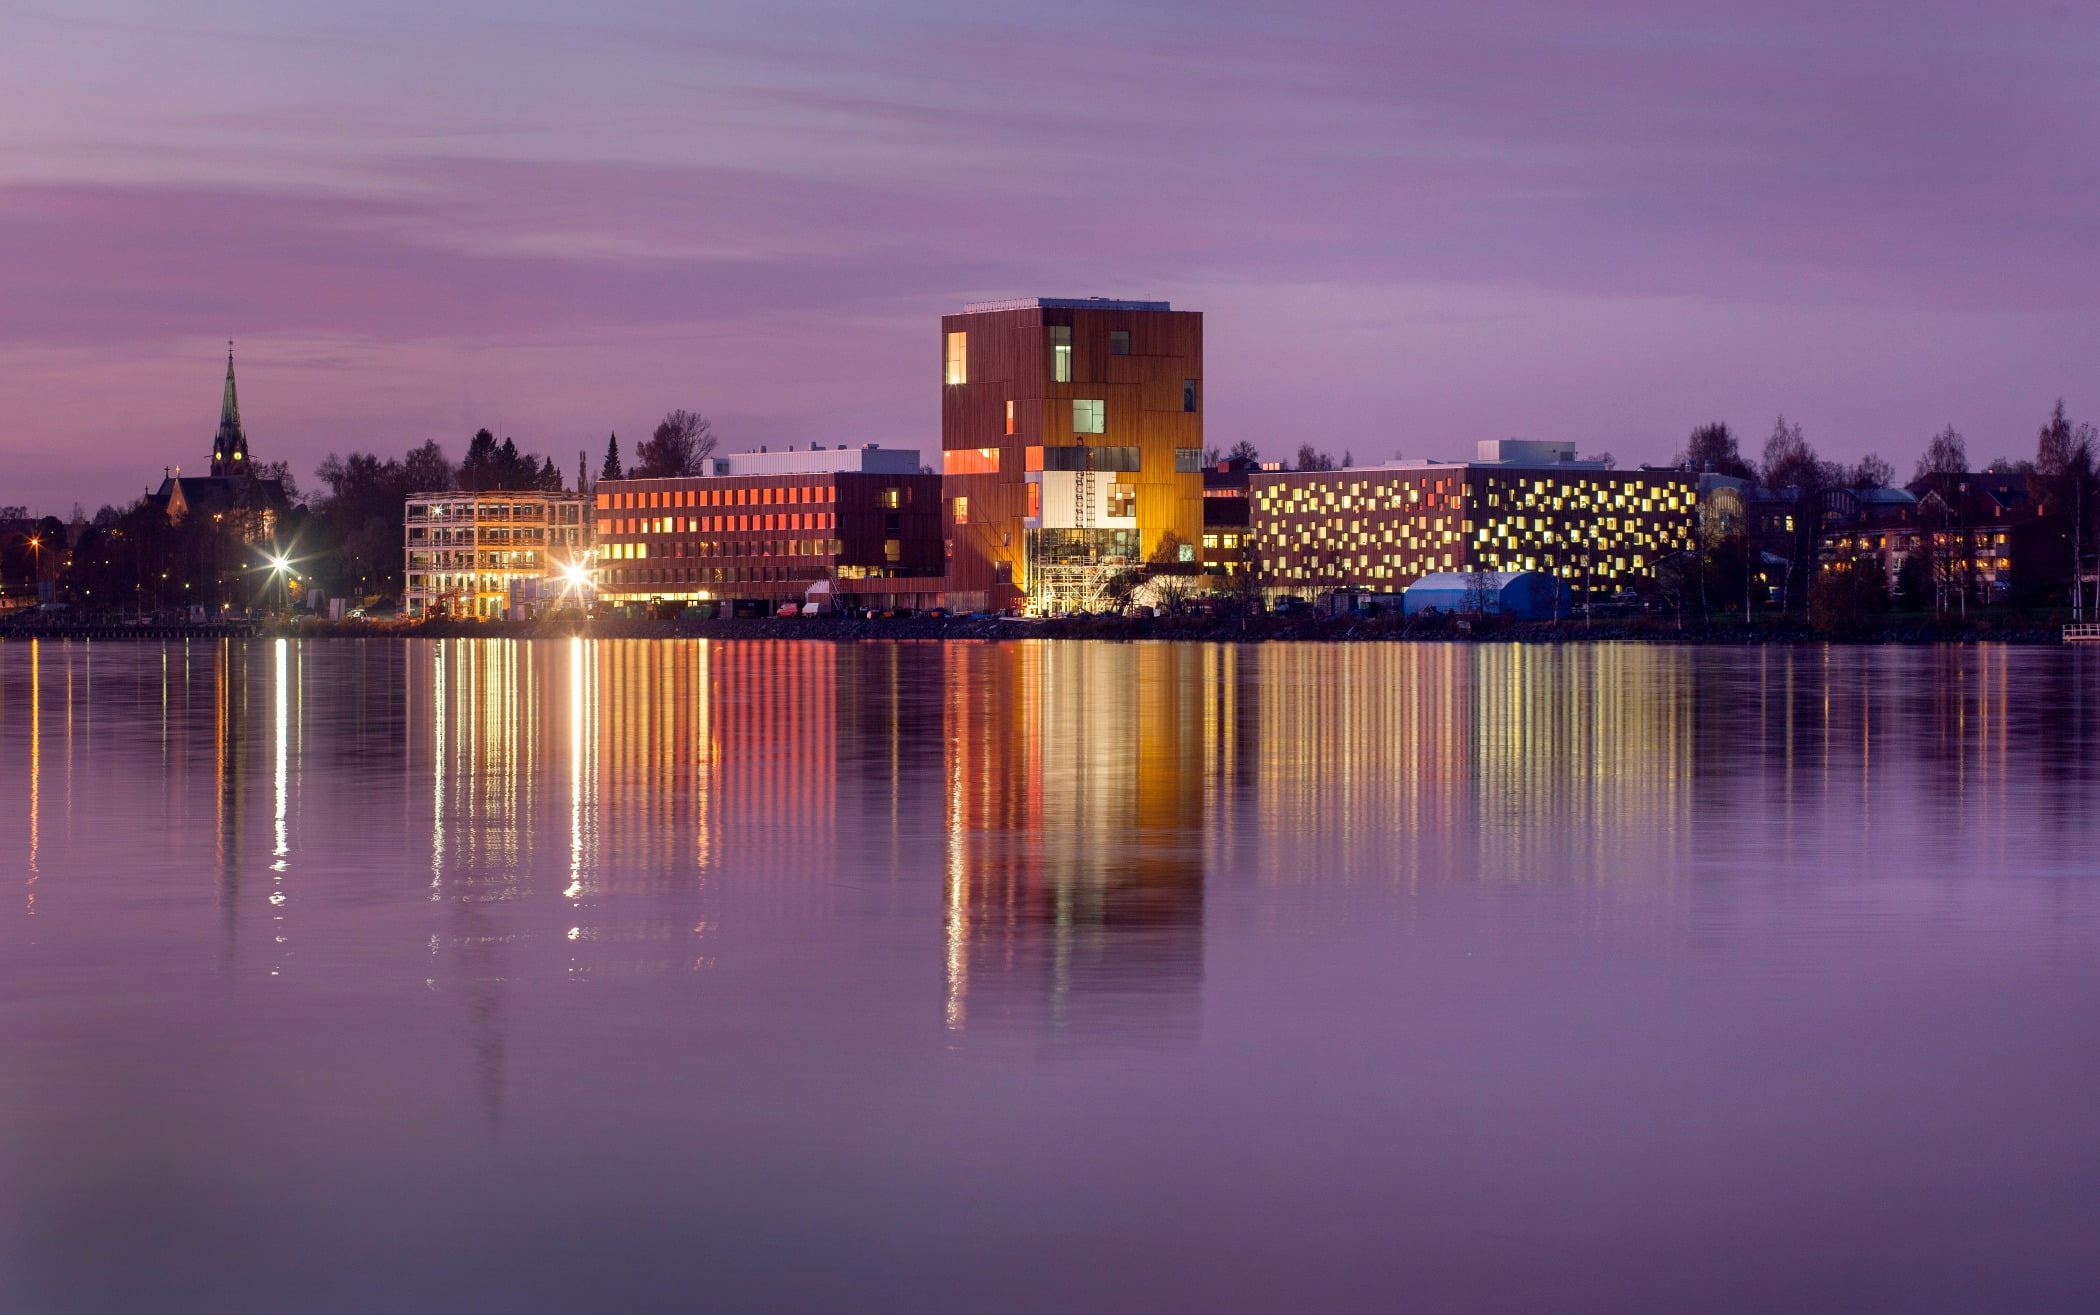 Body of water, Tower block, Sky, Building, Cloud, Purple, Dusk, Lake